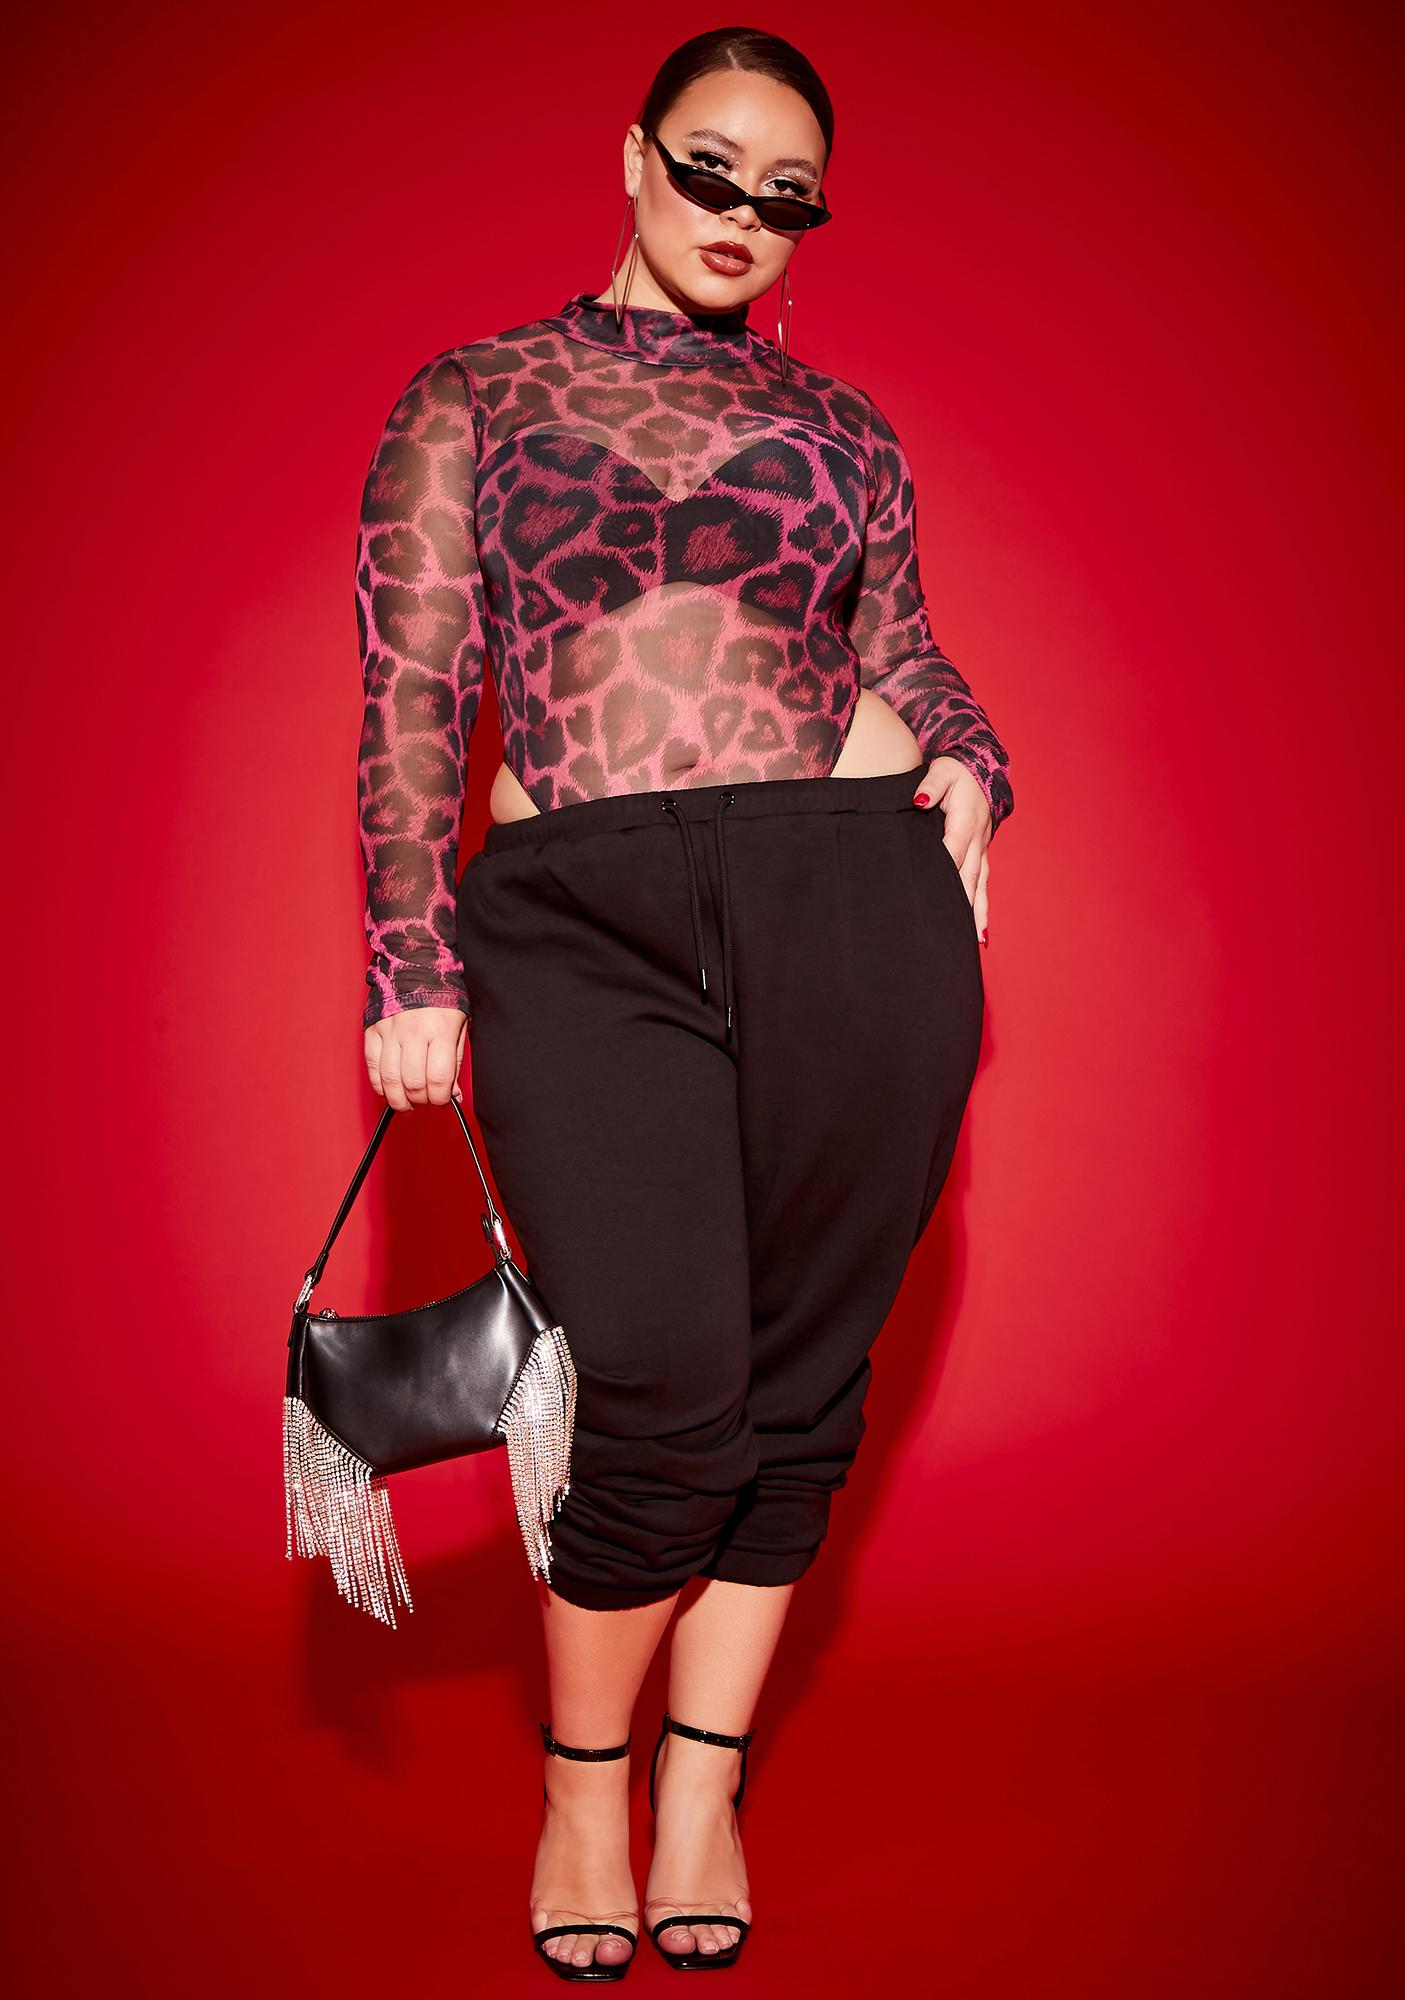 Poster Grl Miss Picking Me Cheetah Heart Bodysuit